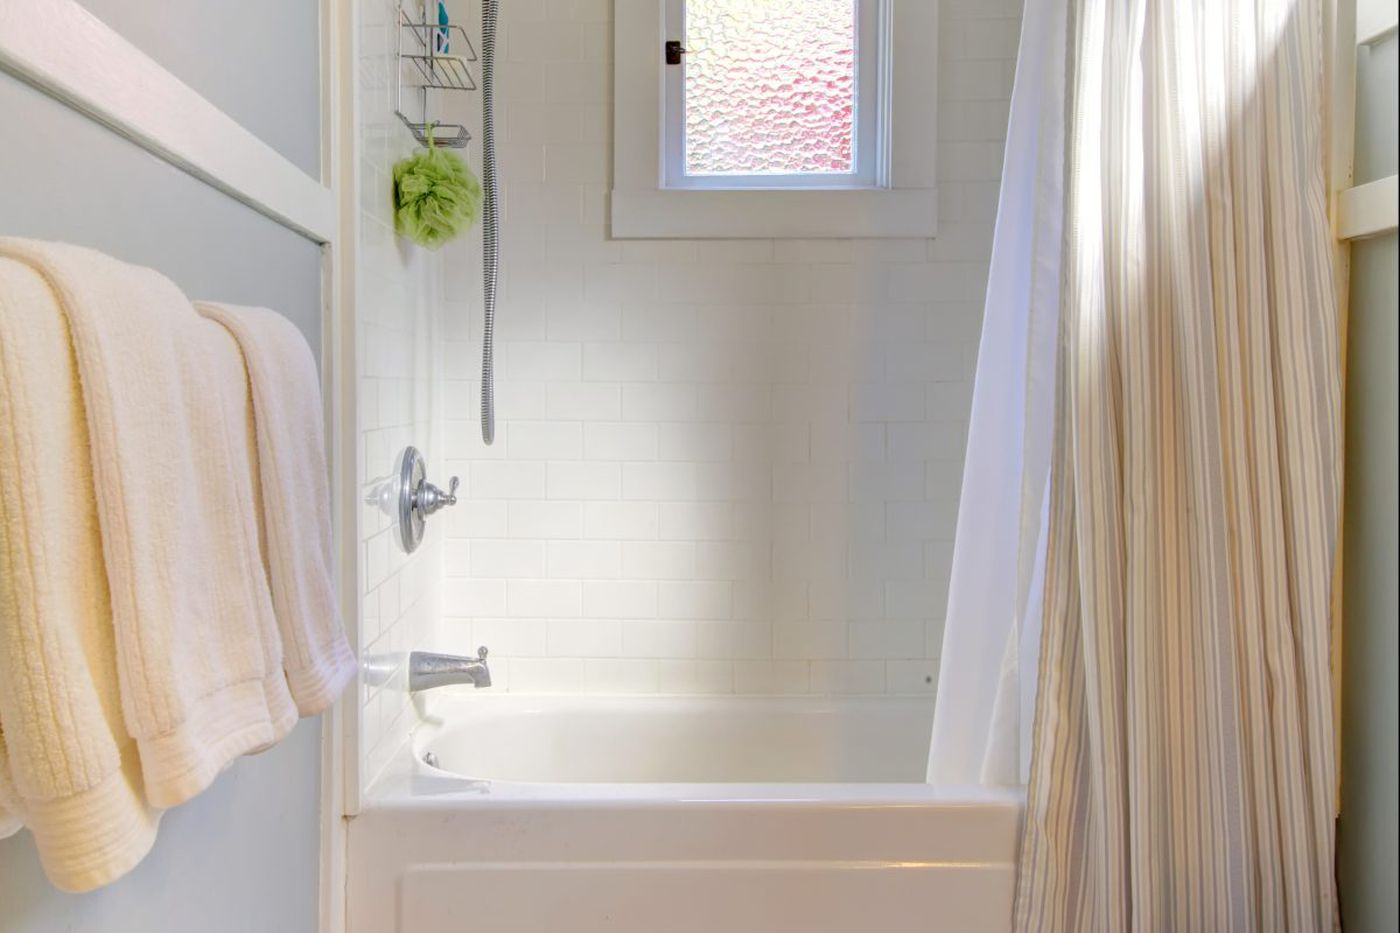 Ask Jennifer Adams: Inexpensive tile alternatives for bathroom updates